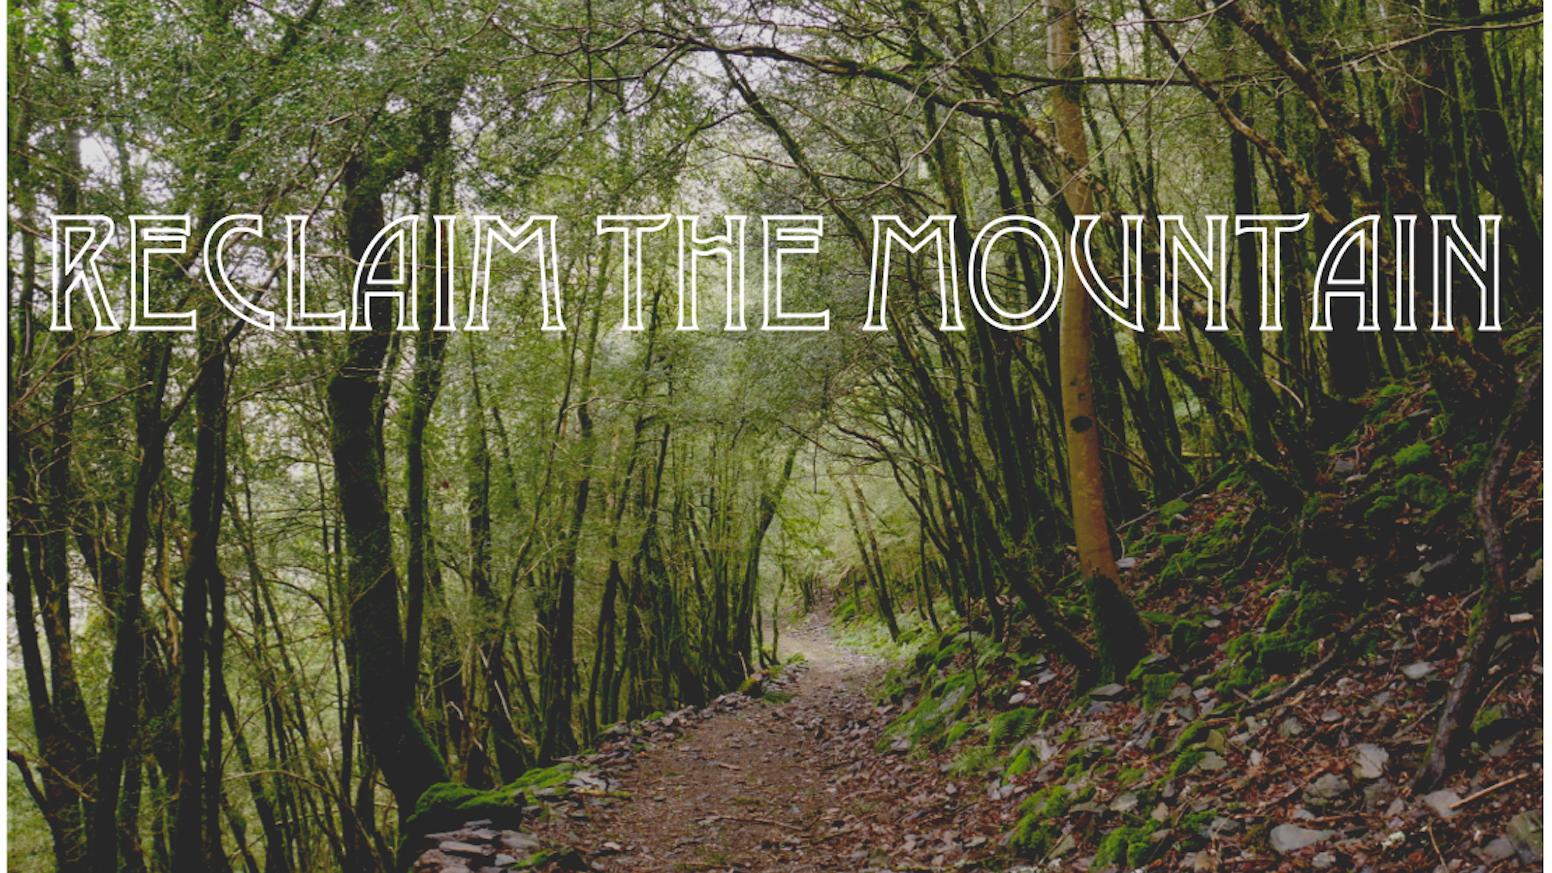 Reclaim the Mountain by Tomatillo — Kickstarter